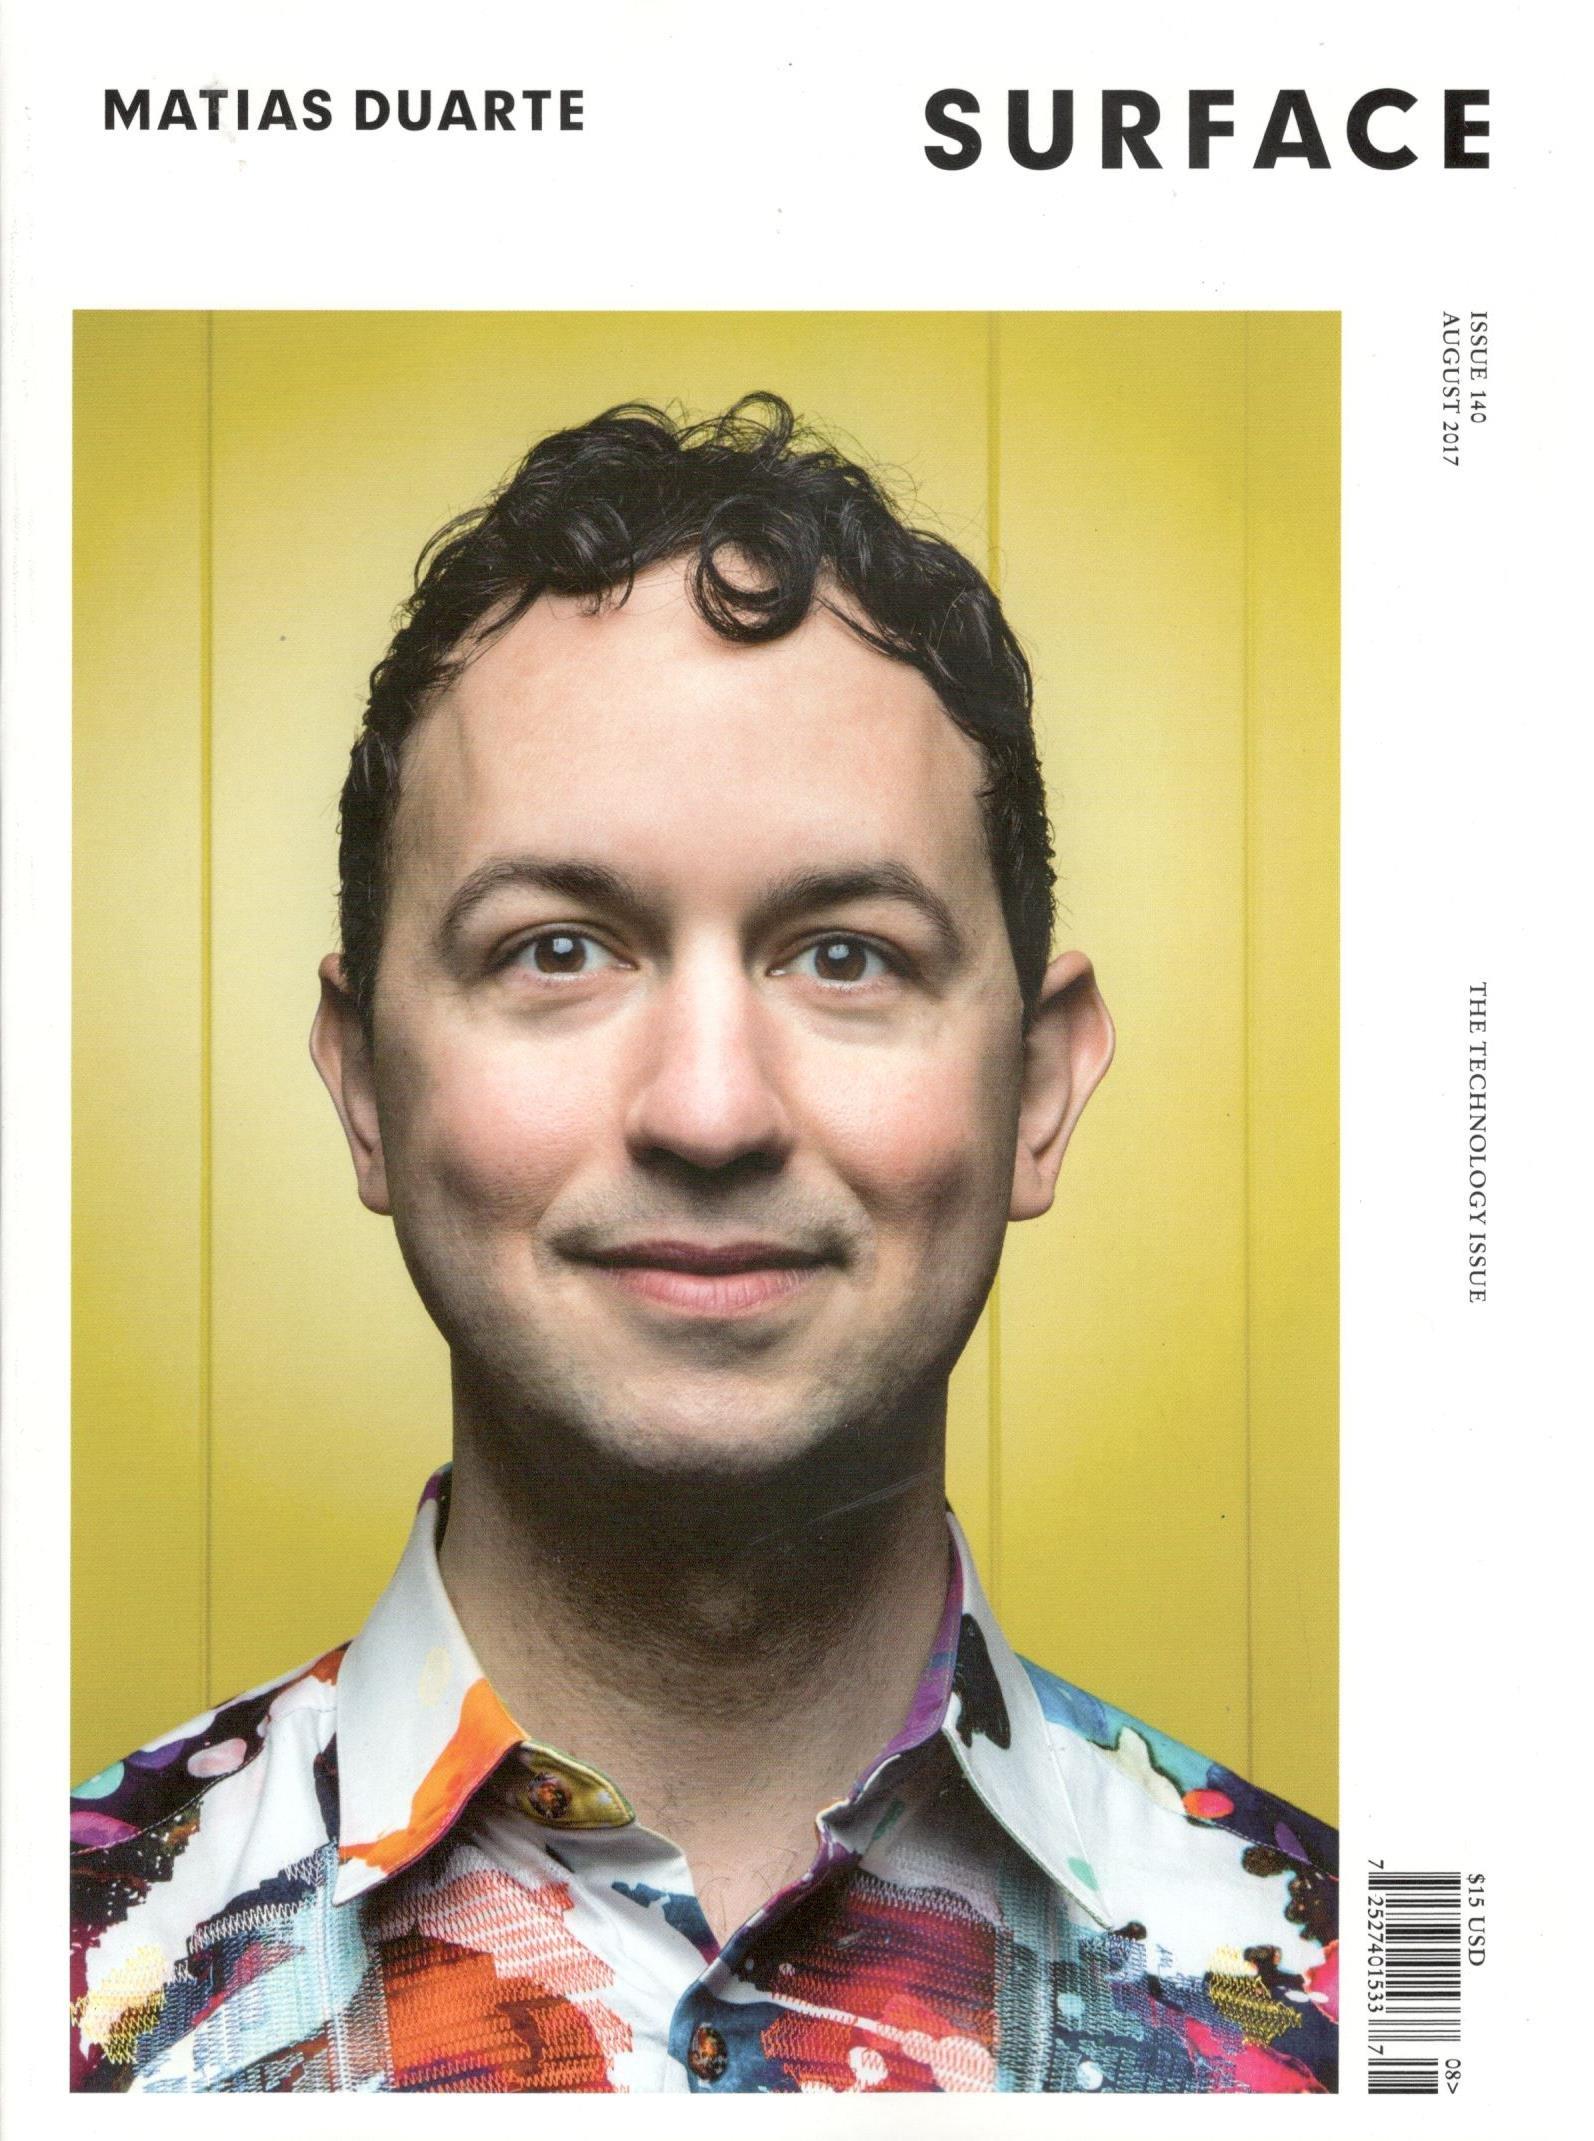 Surface Magazine Issue 140 (August, 2017) Matias Duarte Cover pdf